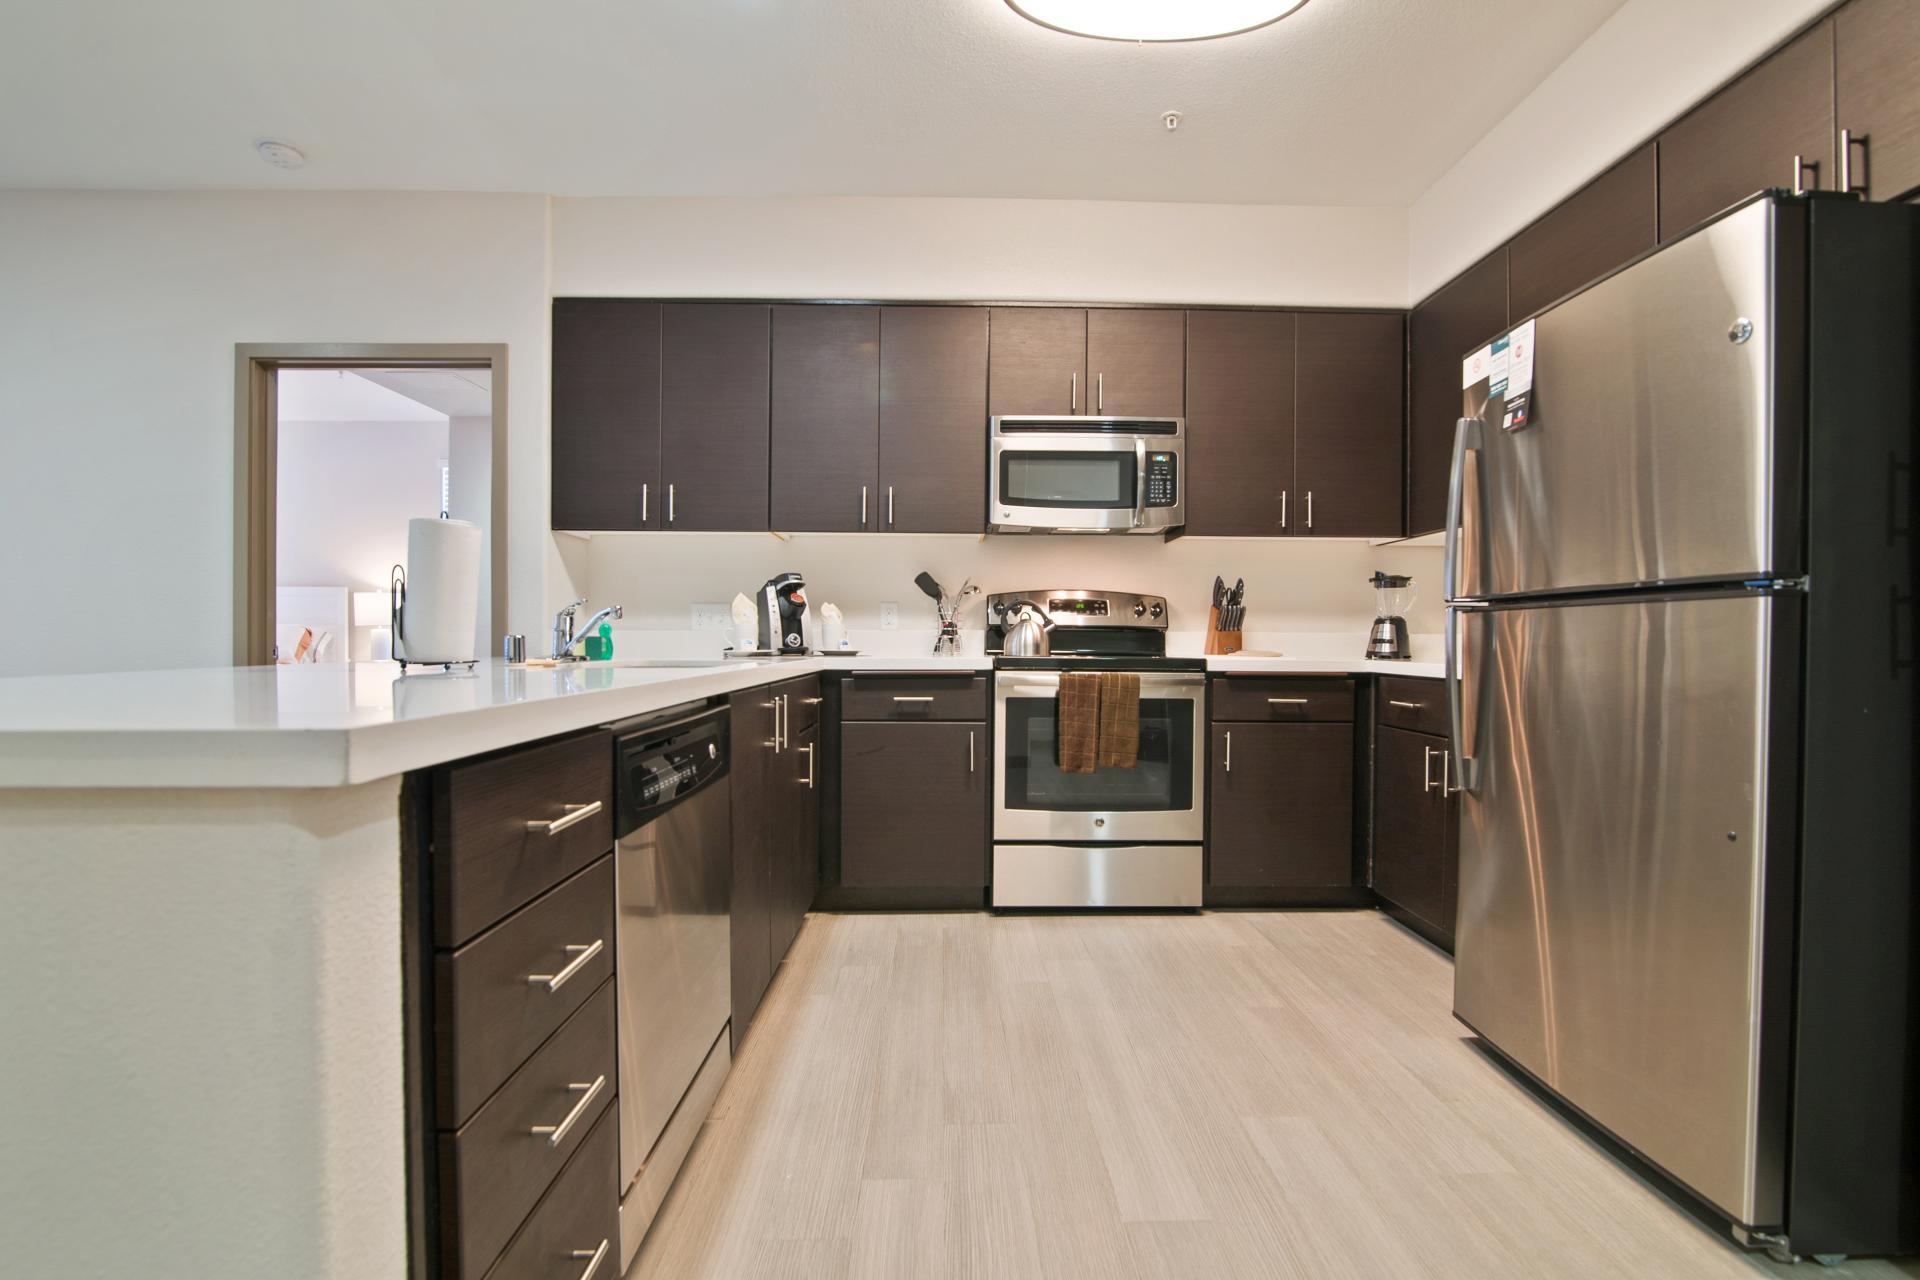 Kitchen at Anton Apartments, Lakewood, Sunnyvale